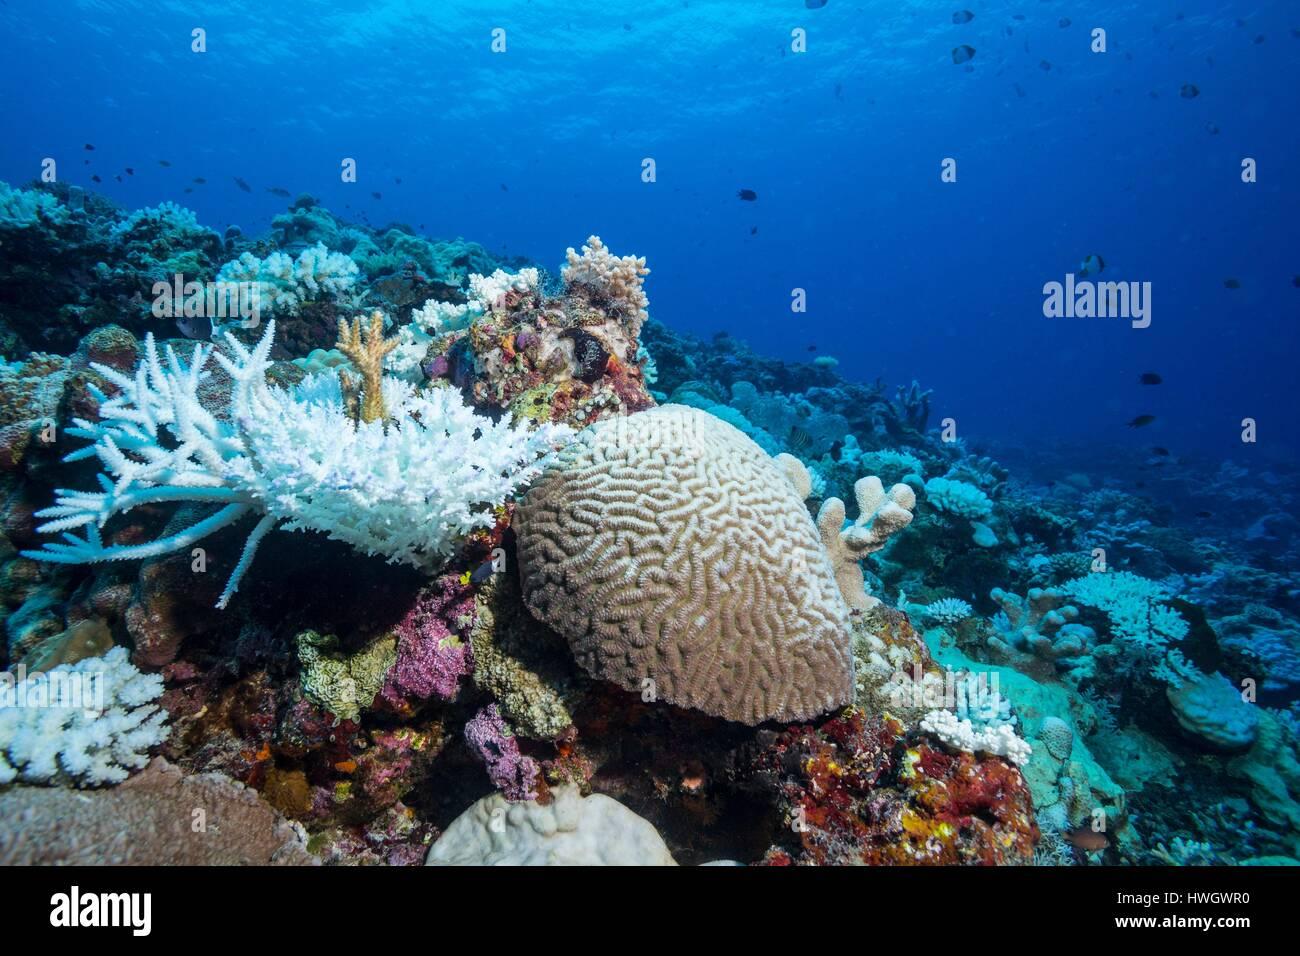 100% authentiek koop goed veel modieus Philippines, Mindoro, Apo Reef Natural Park, coral reef ...